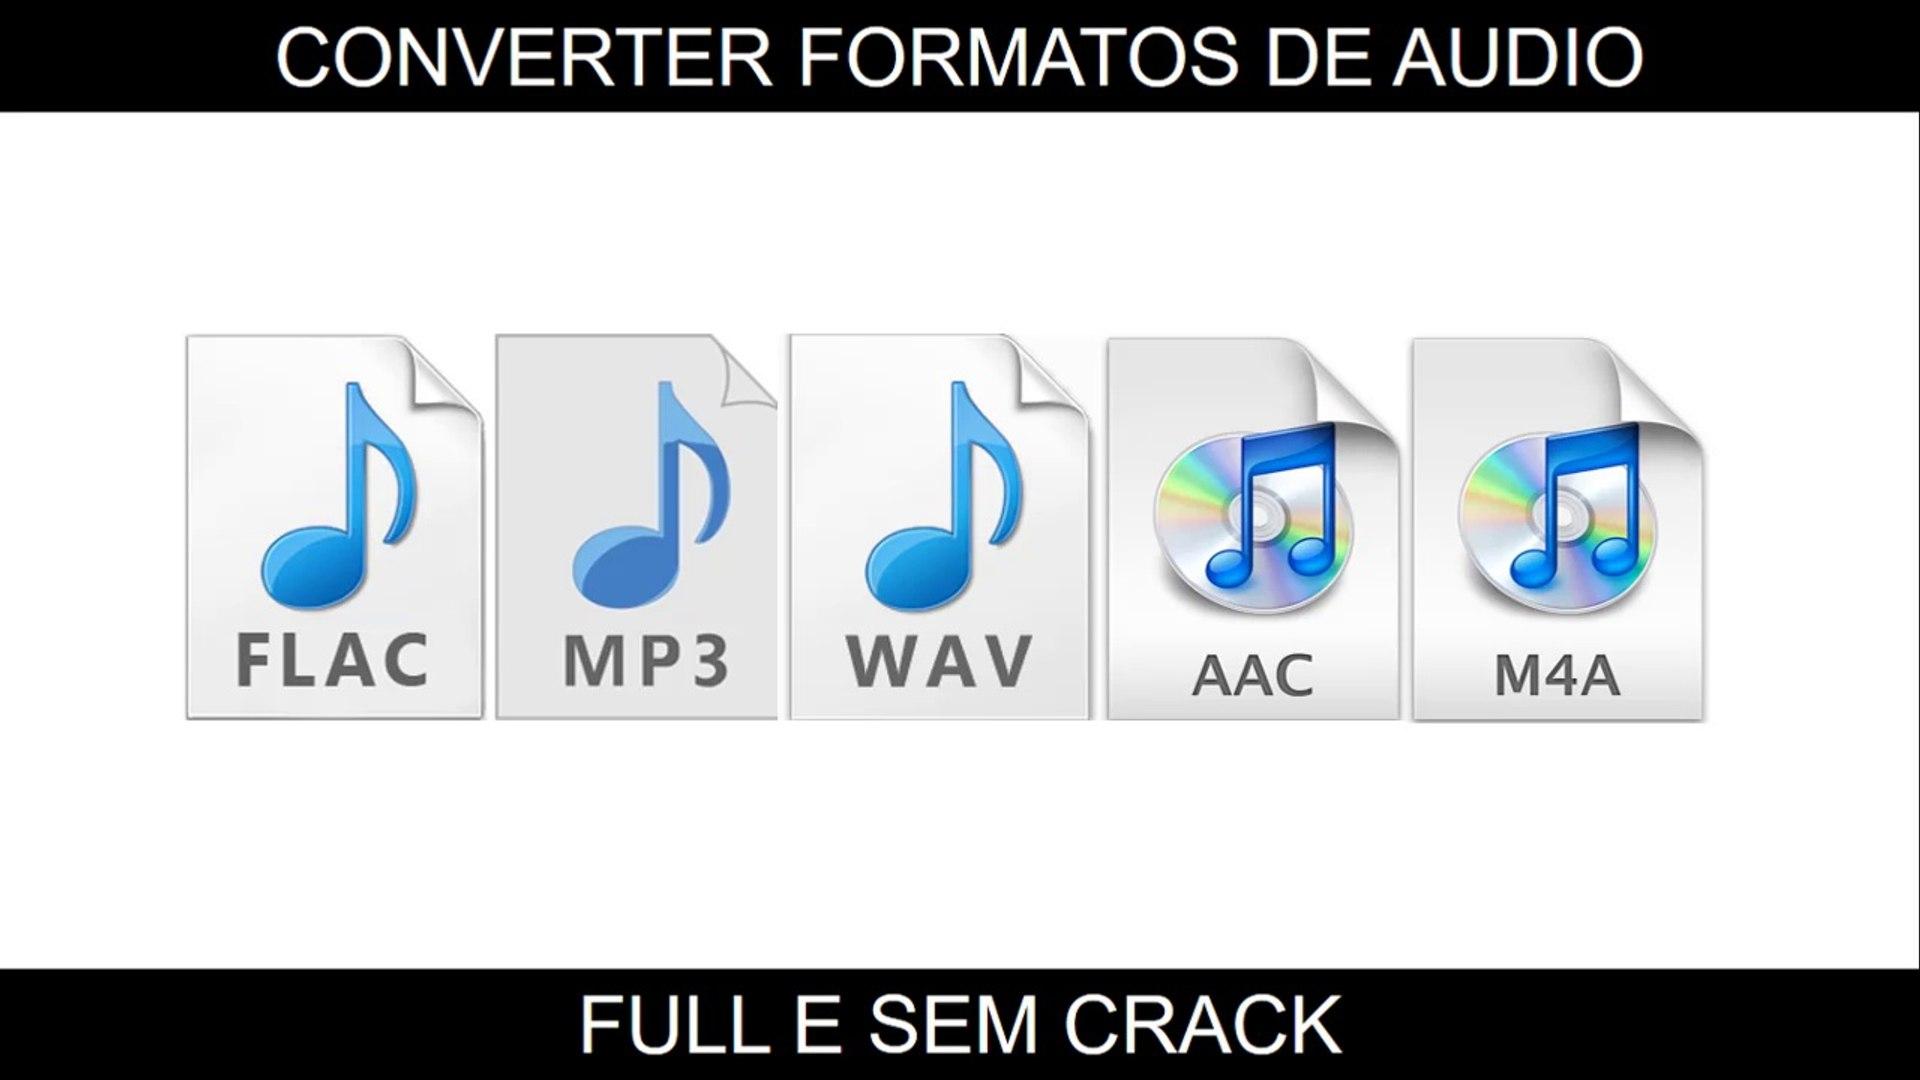 EM AUDIO AMR MP3 PARA BAIXAR CONVERTER PROGRAMA